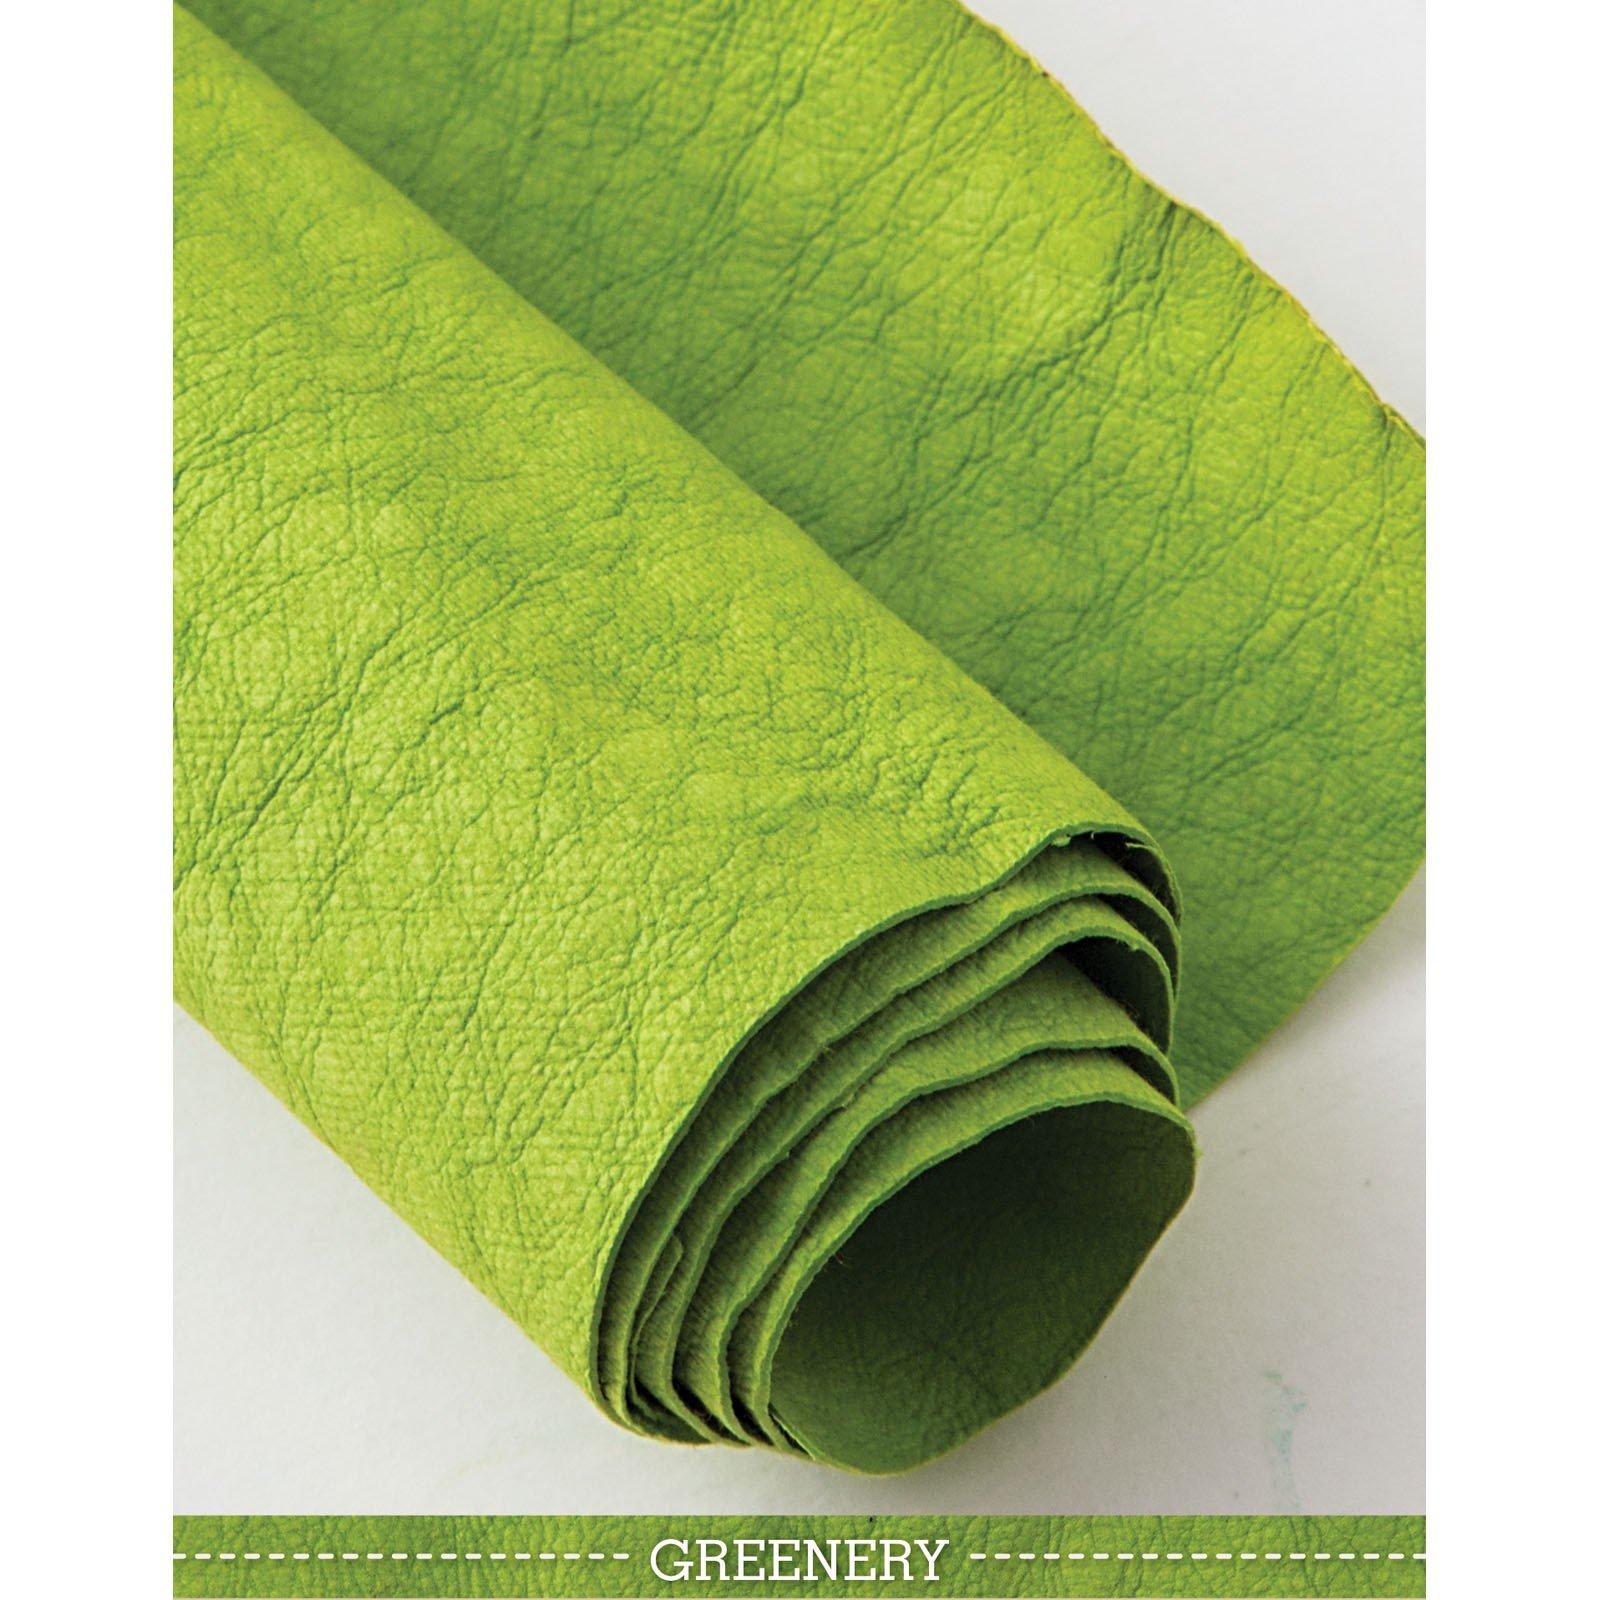 Greenery Kraft-Tex Designer Paper Fabric - approx. 18 x 28 - prewashed - CTP20382